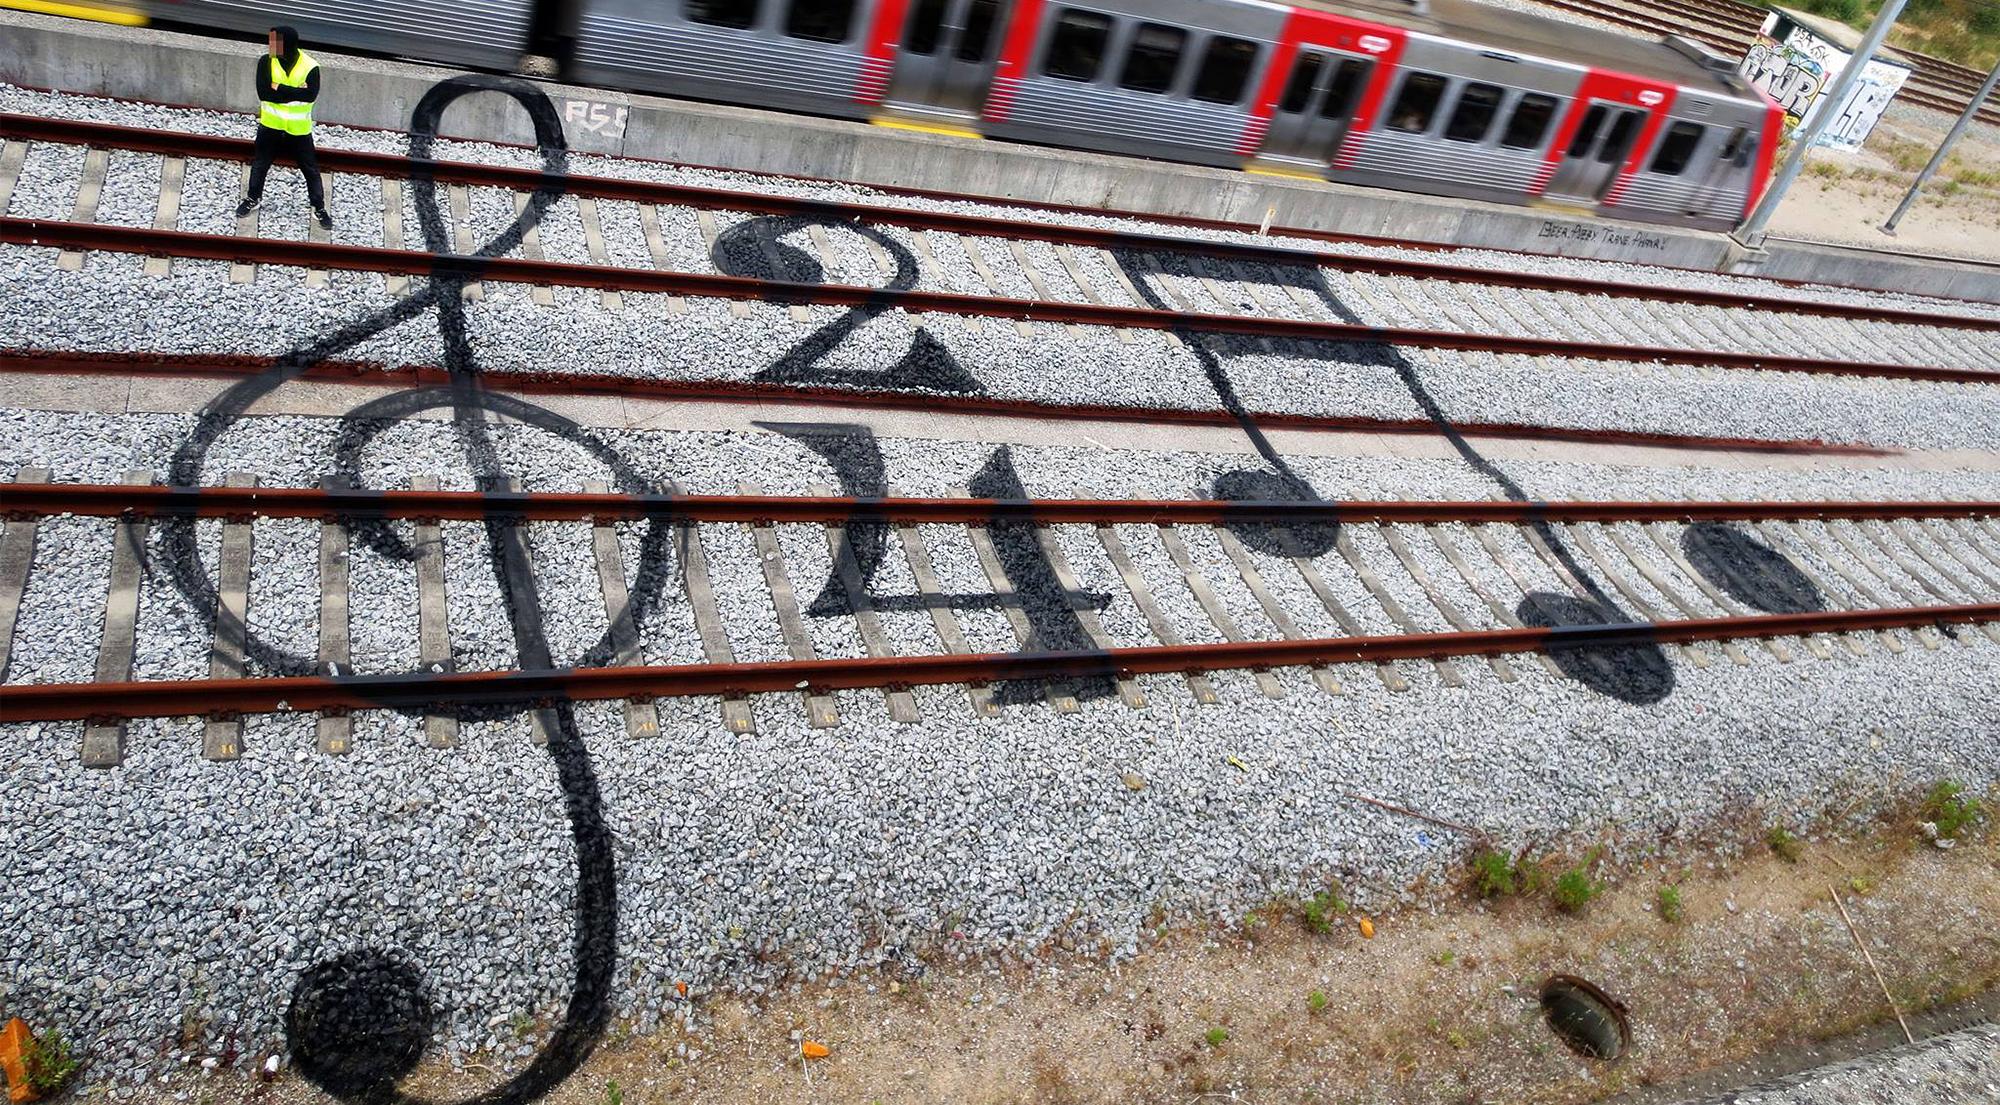 Clever Urban Art On Railroad Tracks By Artur Bordalo